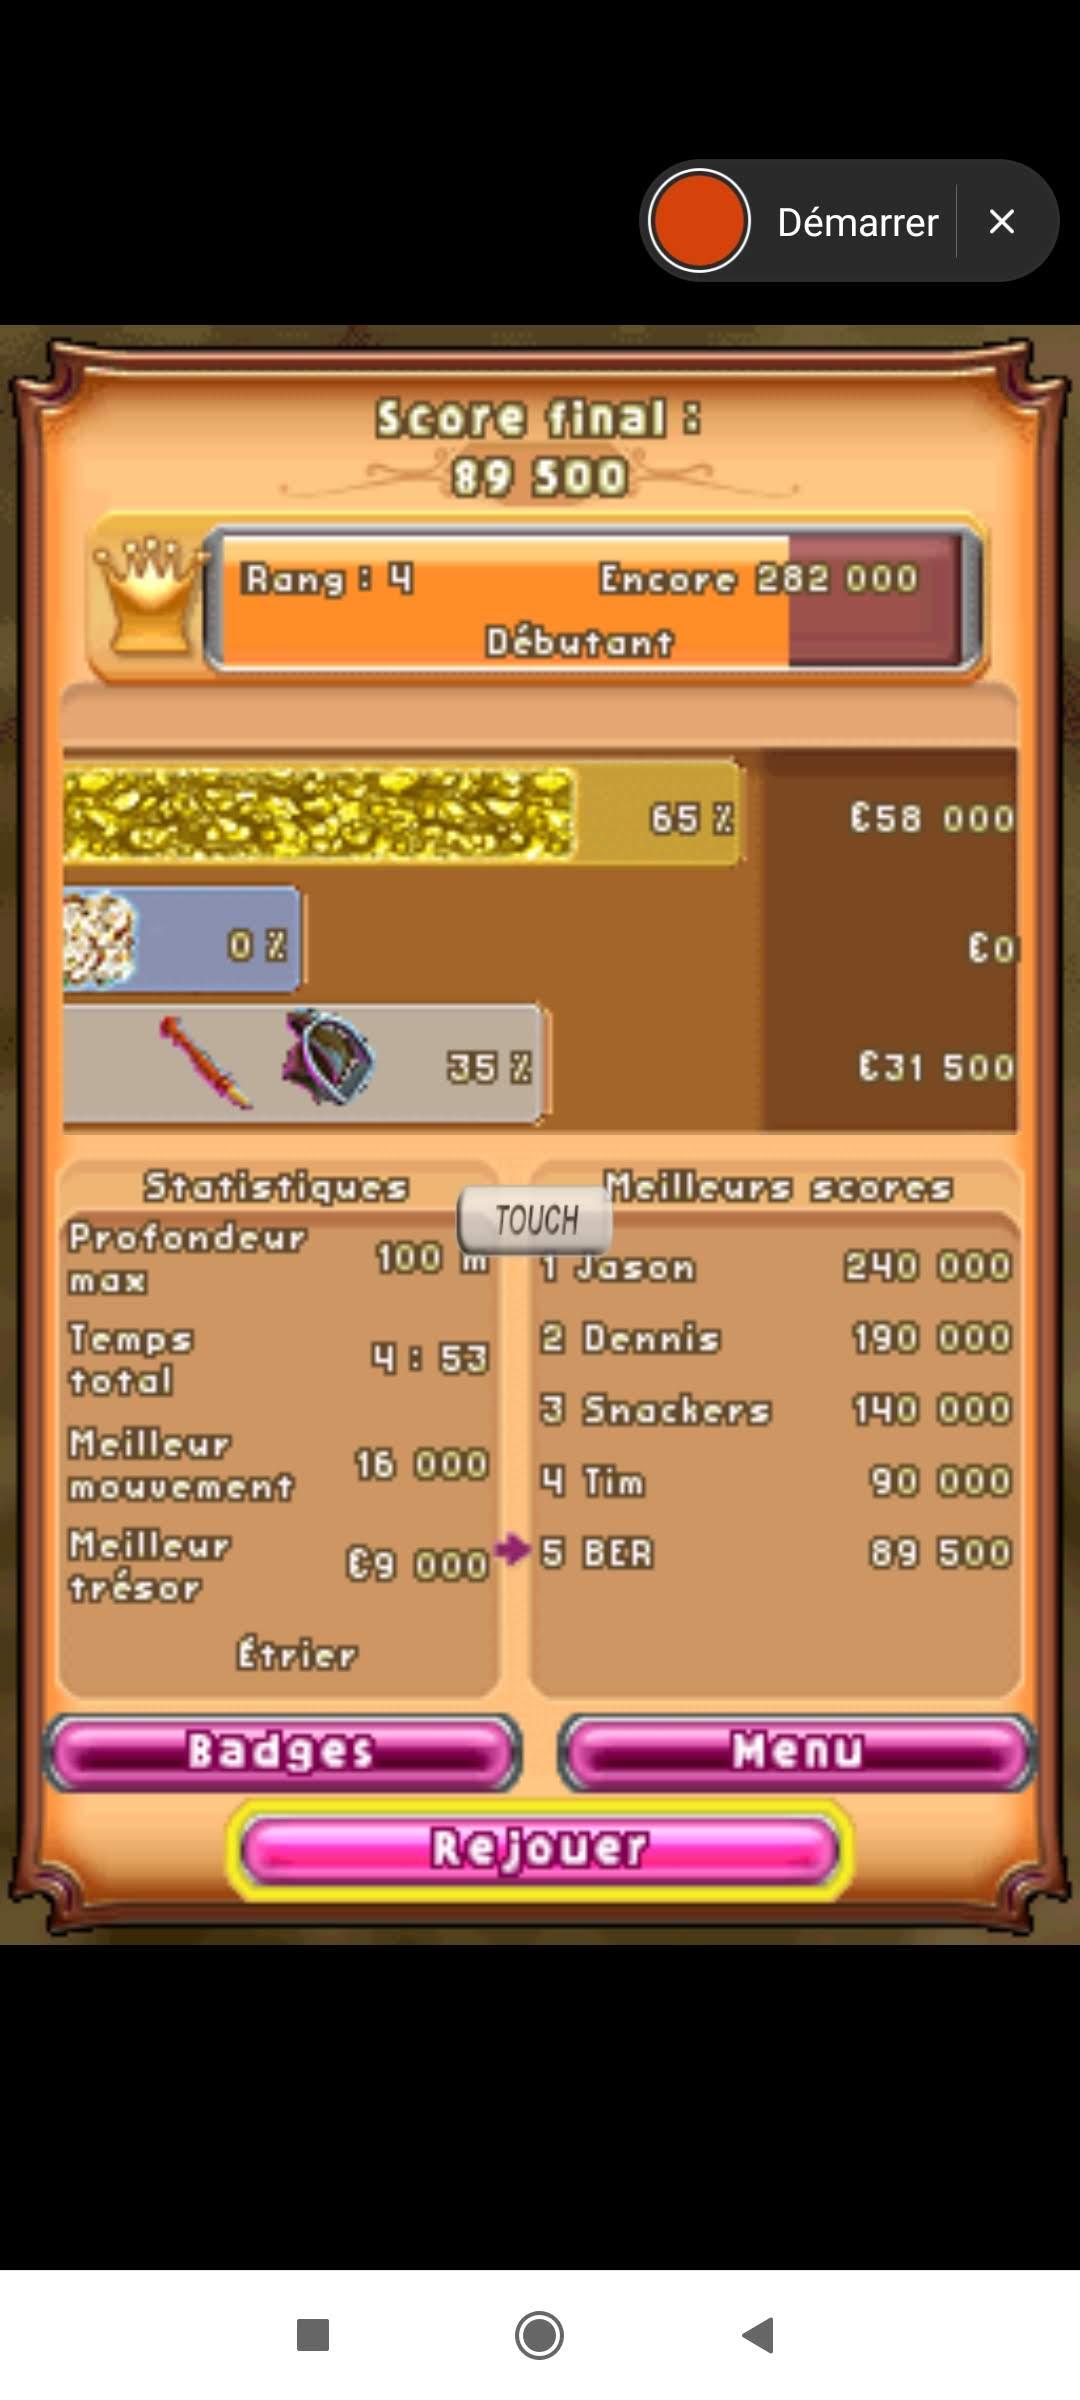 Larquey: Bejeweled 3: Diamond Mine [Max Depth] (Nintendo DS Emulated) 100 points on 2020-09-27 12:25:43